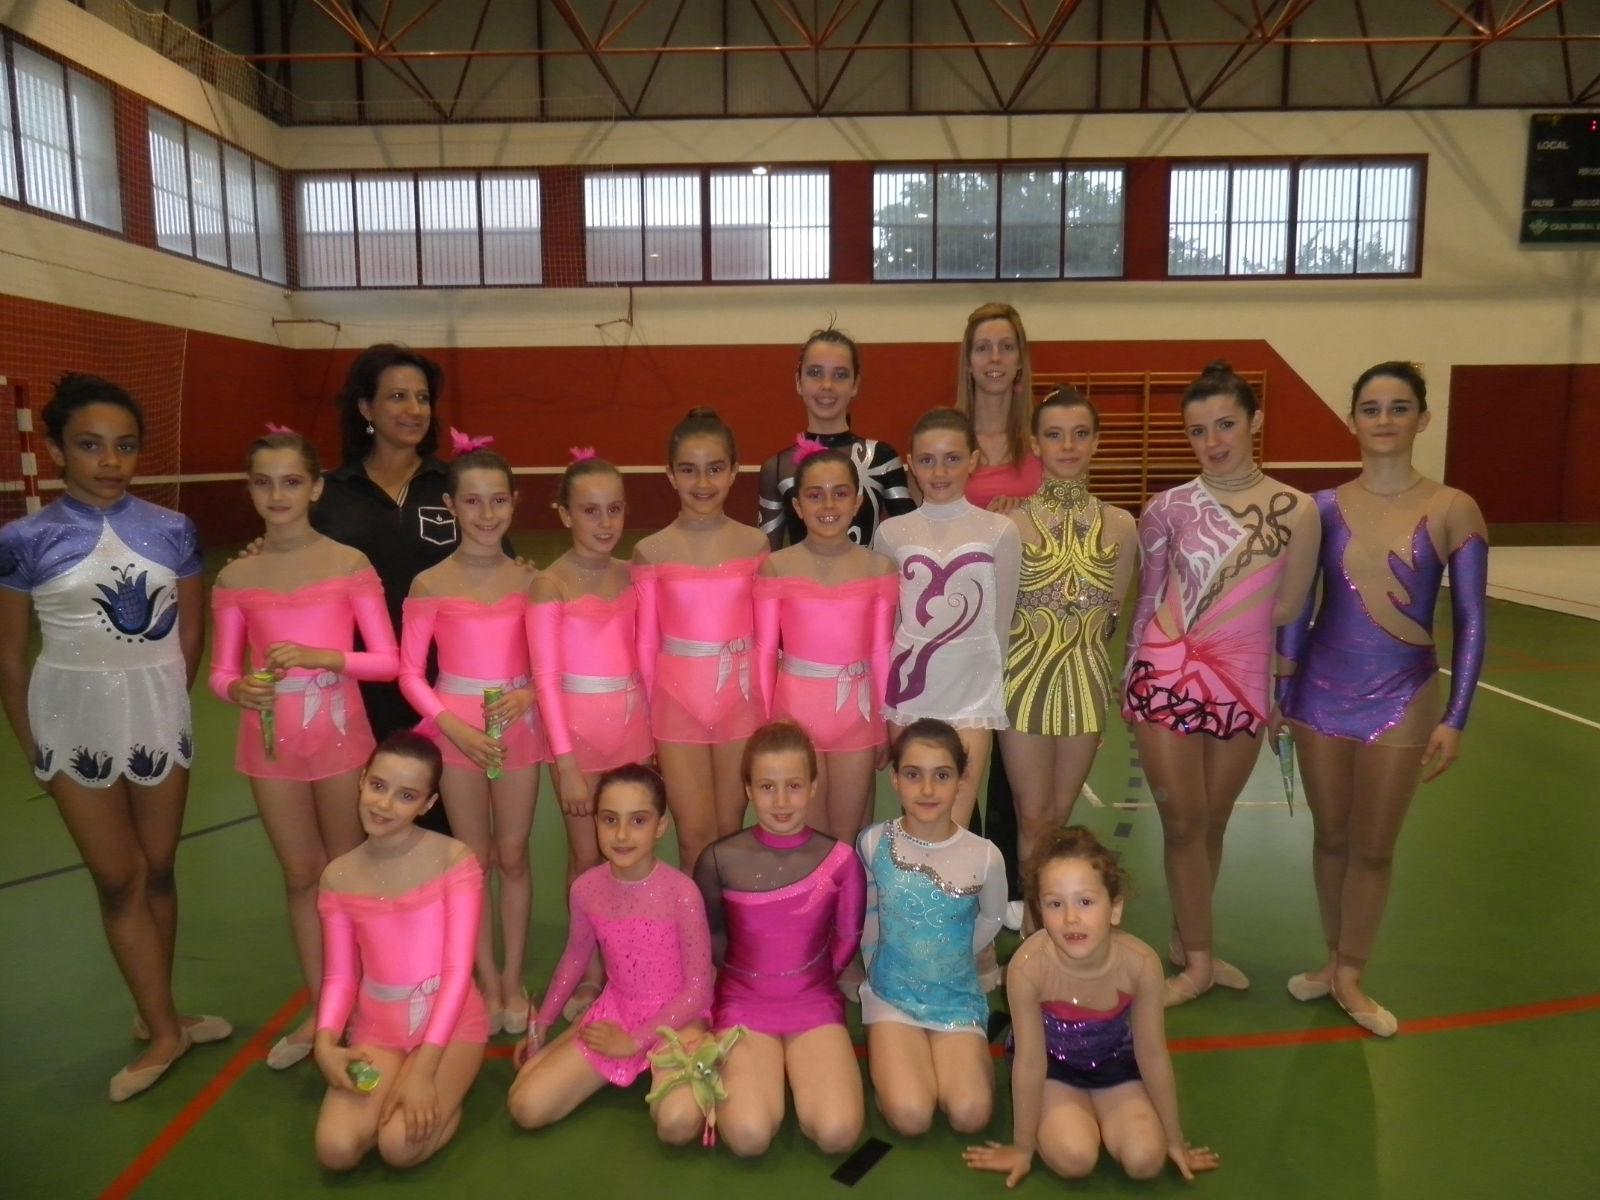 Club gimnasia ritmica de ansoain exhibici n arguedas for Club gimnasio